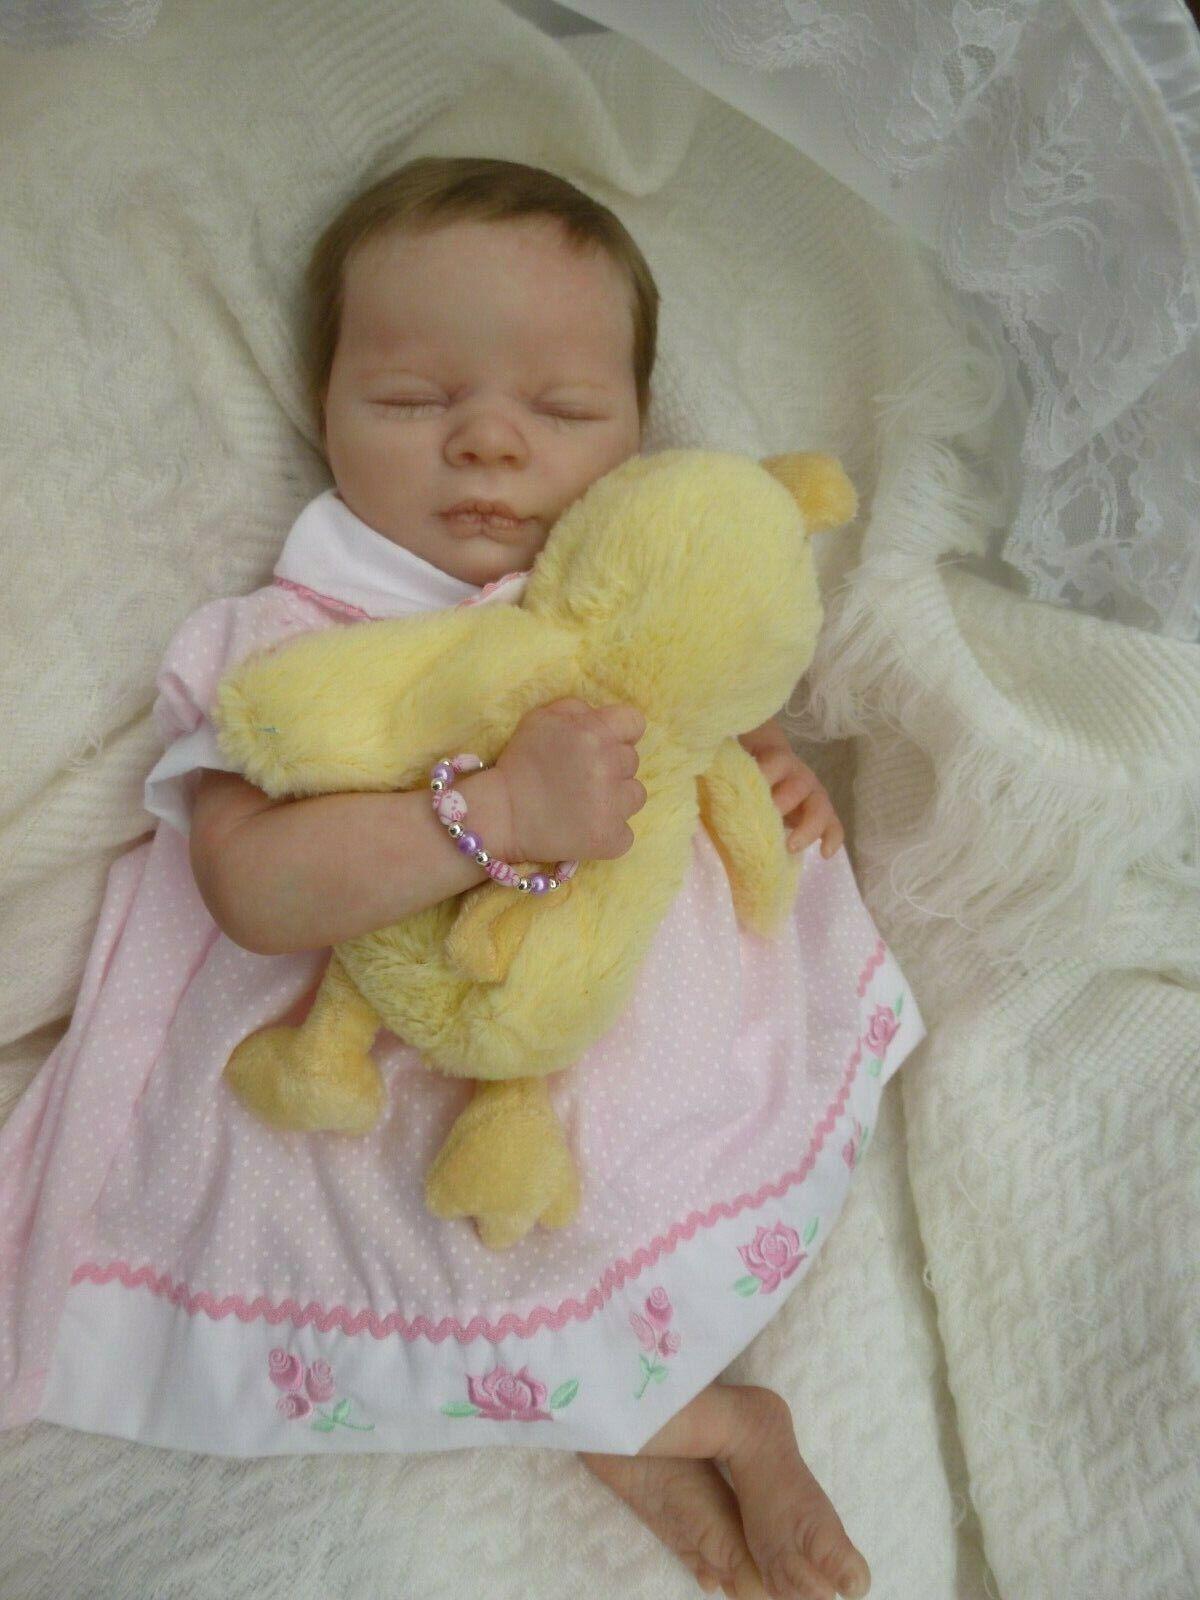 KATIE A PRETTY LITTLE REALBORN BABY GIRL